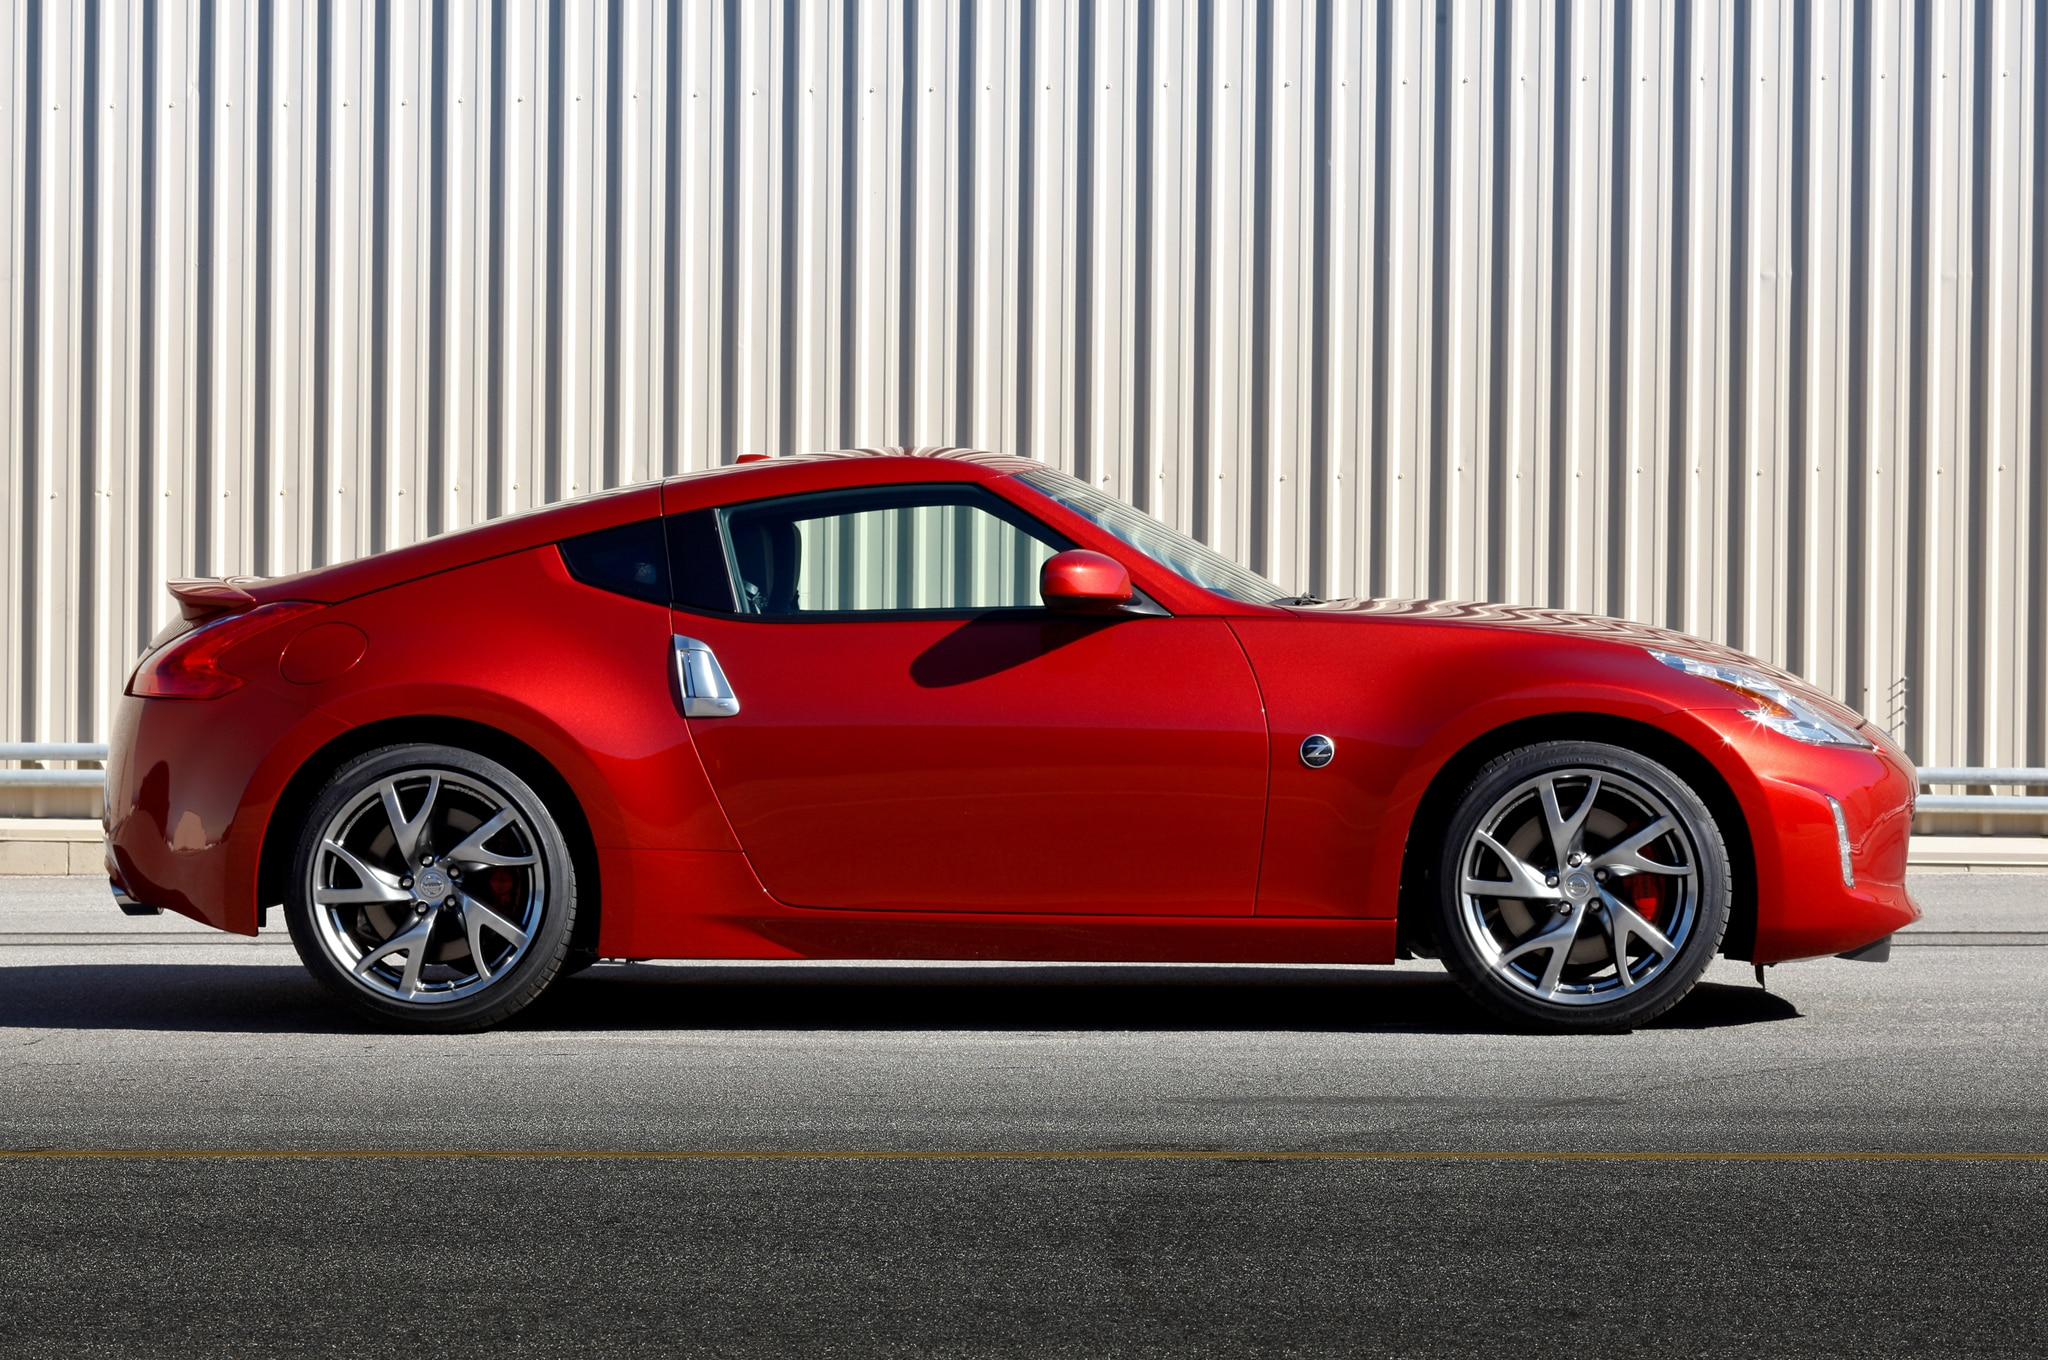 2013 Nissan 370Z Coupe Profile1